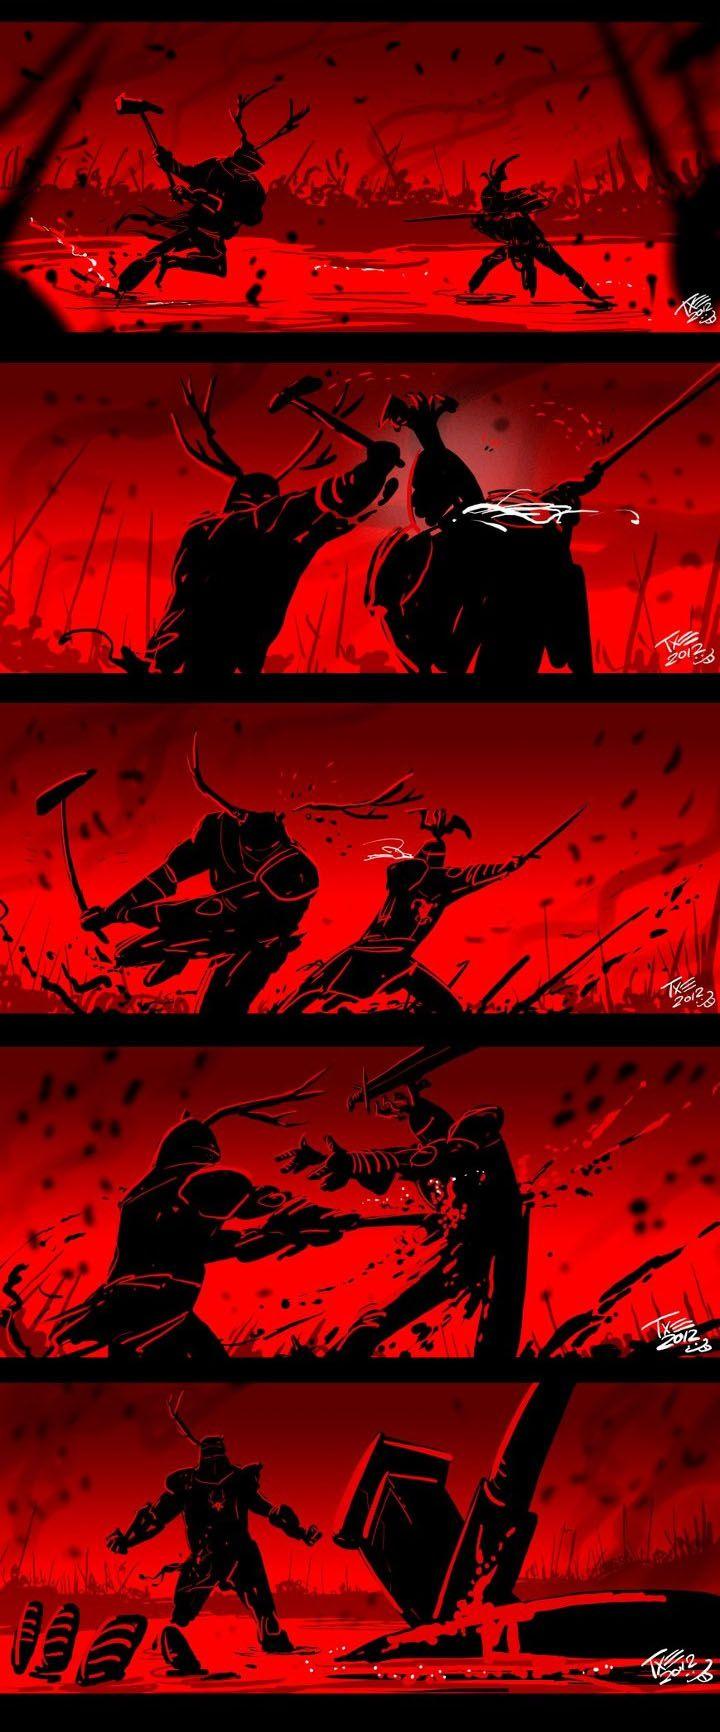 """Rhaegar fought valiantly, Rhaegar fought nobly, Rhaegar fought honorably. And Rhaegar died"" Prince Rhaegar Targaryen, the Last Dragon"